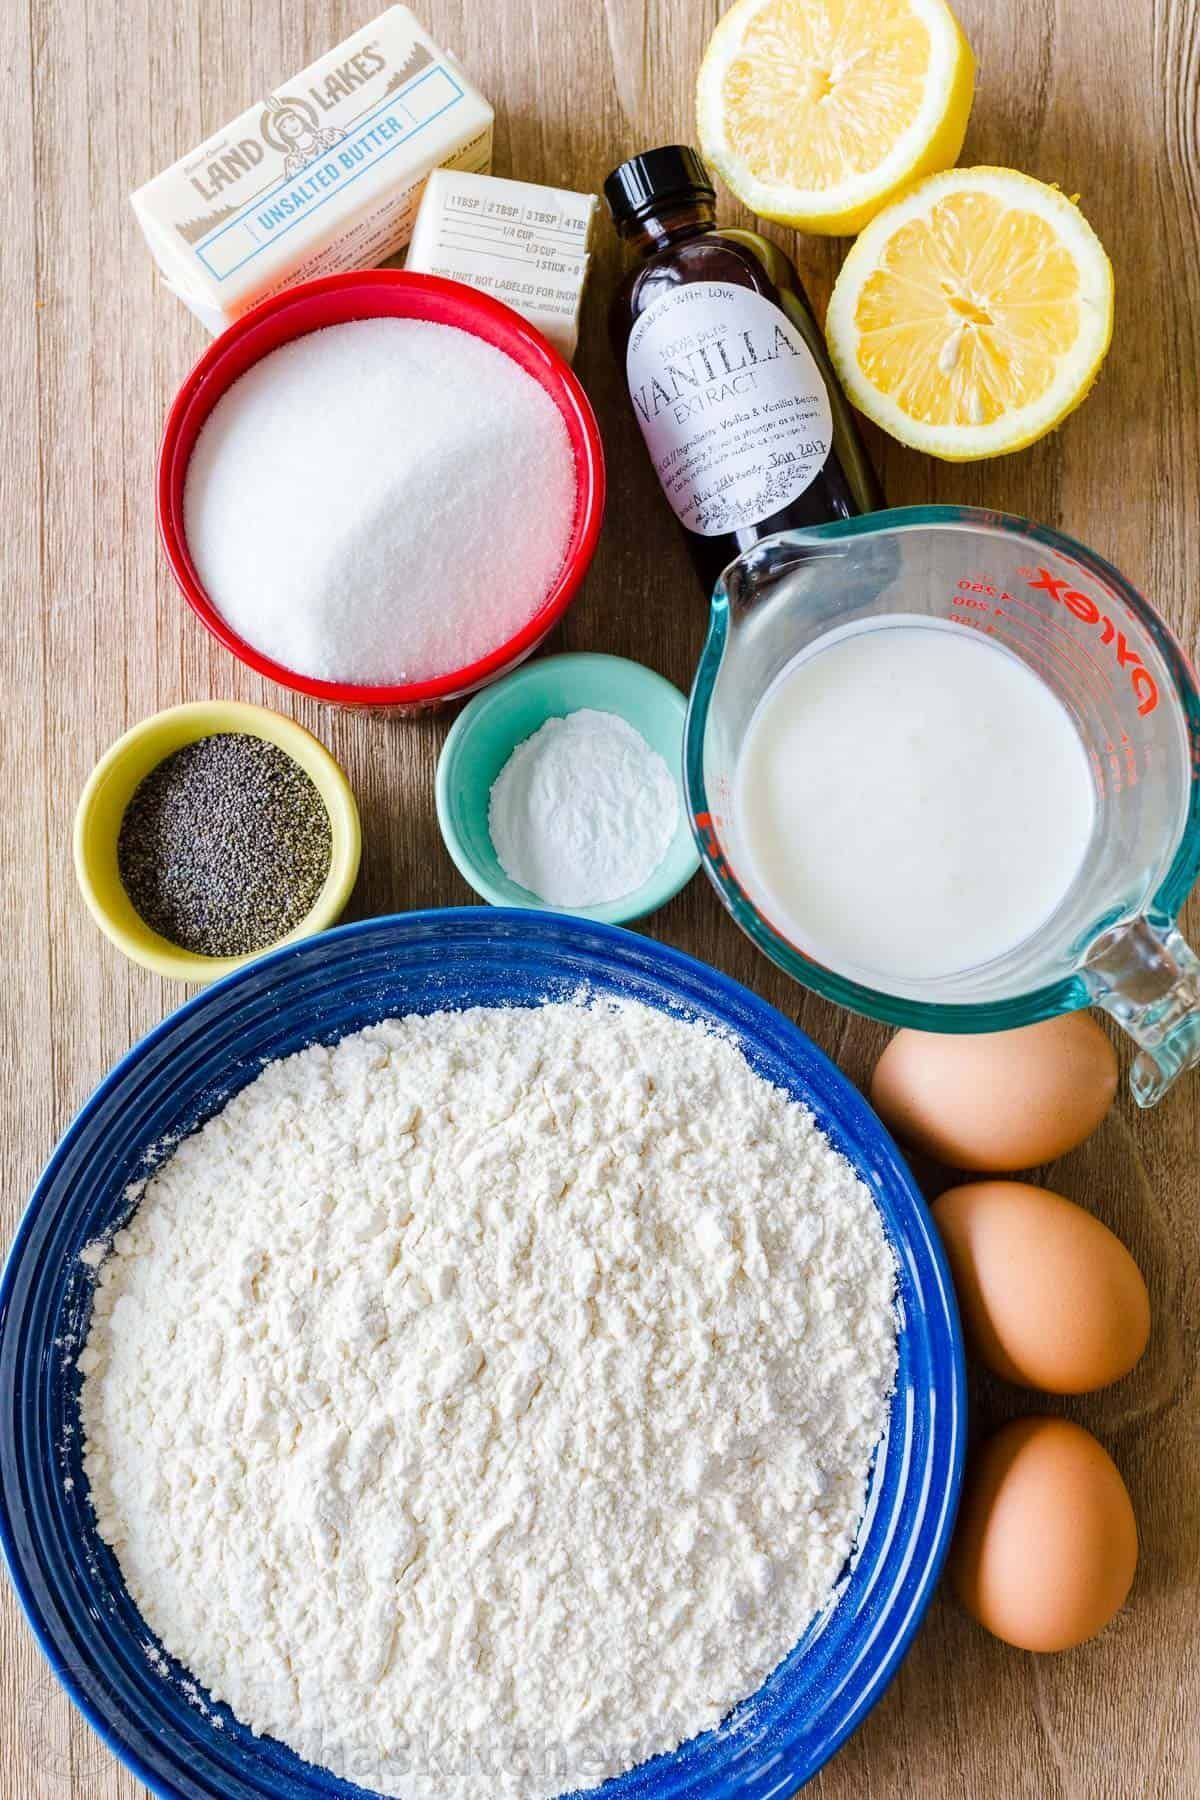 Lemon Poppy Seed Cake is soft, moist, easy to make and has wonderful fresh lemon flavor. The whipped Lemon Buttercream Frosting is incredible! #poppyseedlemoncake #lemonrecipe #lemondessert #cake #lemonpoppyseedcake #lemoncake #lemons #natashaskitchen #poppyseeds #lemonbuttercream Lemon Poppy Seed Cake is soft, moist, easy to make and has wonderful fresh lemon flavor. The whipped Lemon Buttercream Frosting is incredible! #poppyseedlemoncake #lemonrecipe #lemondessert #cake #lemonpoppyseedcake #l #lemonbuttercream